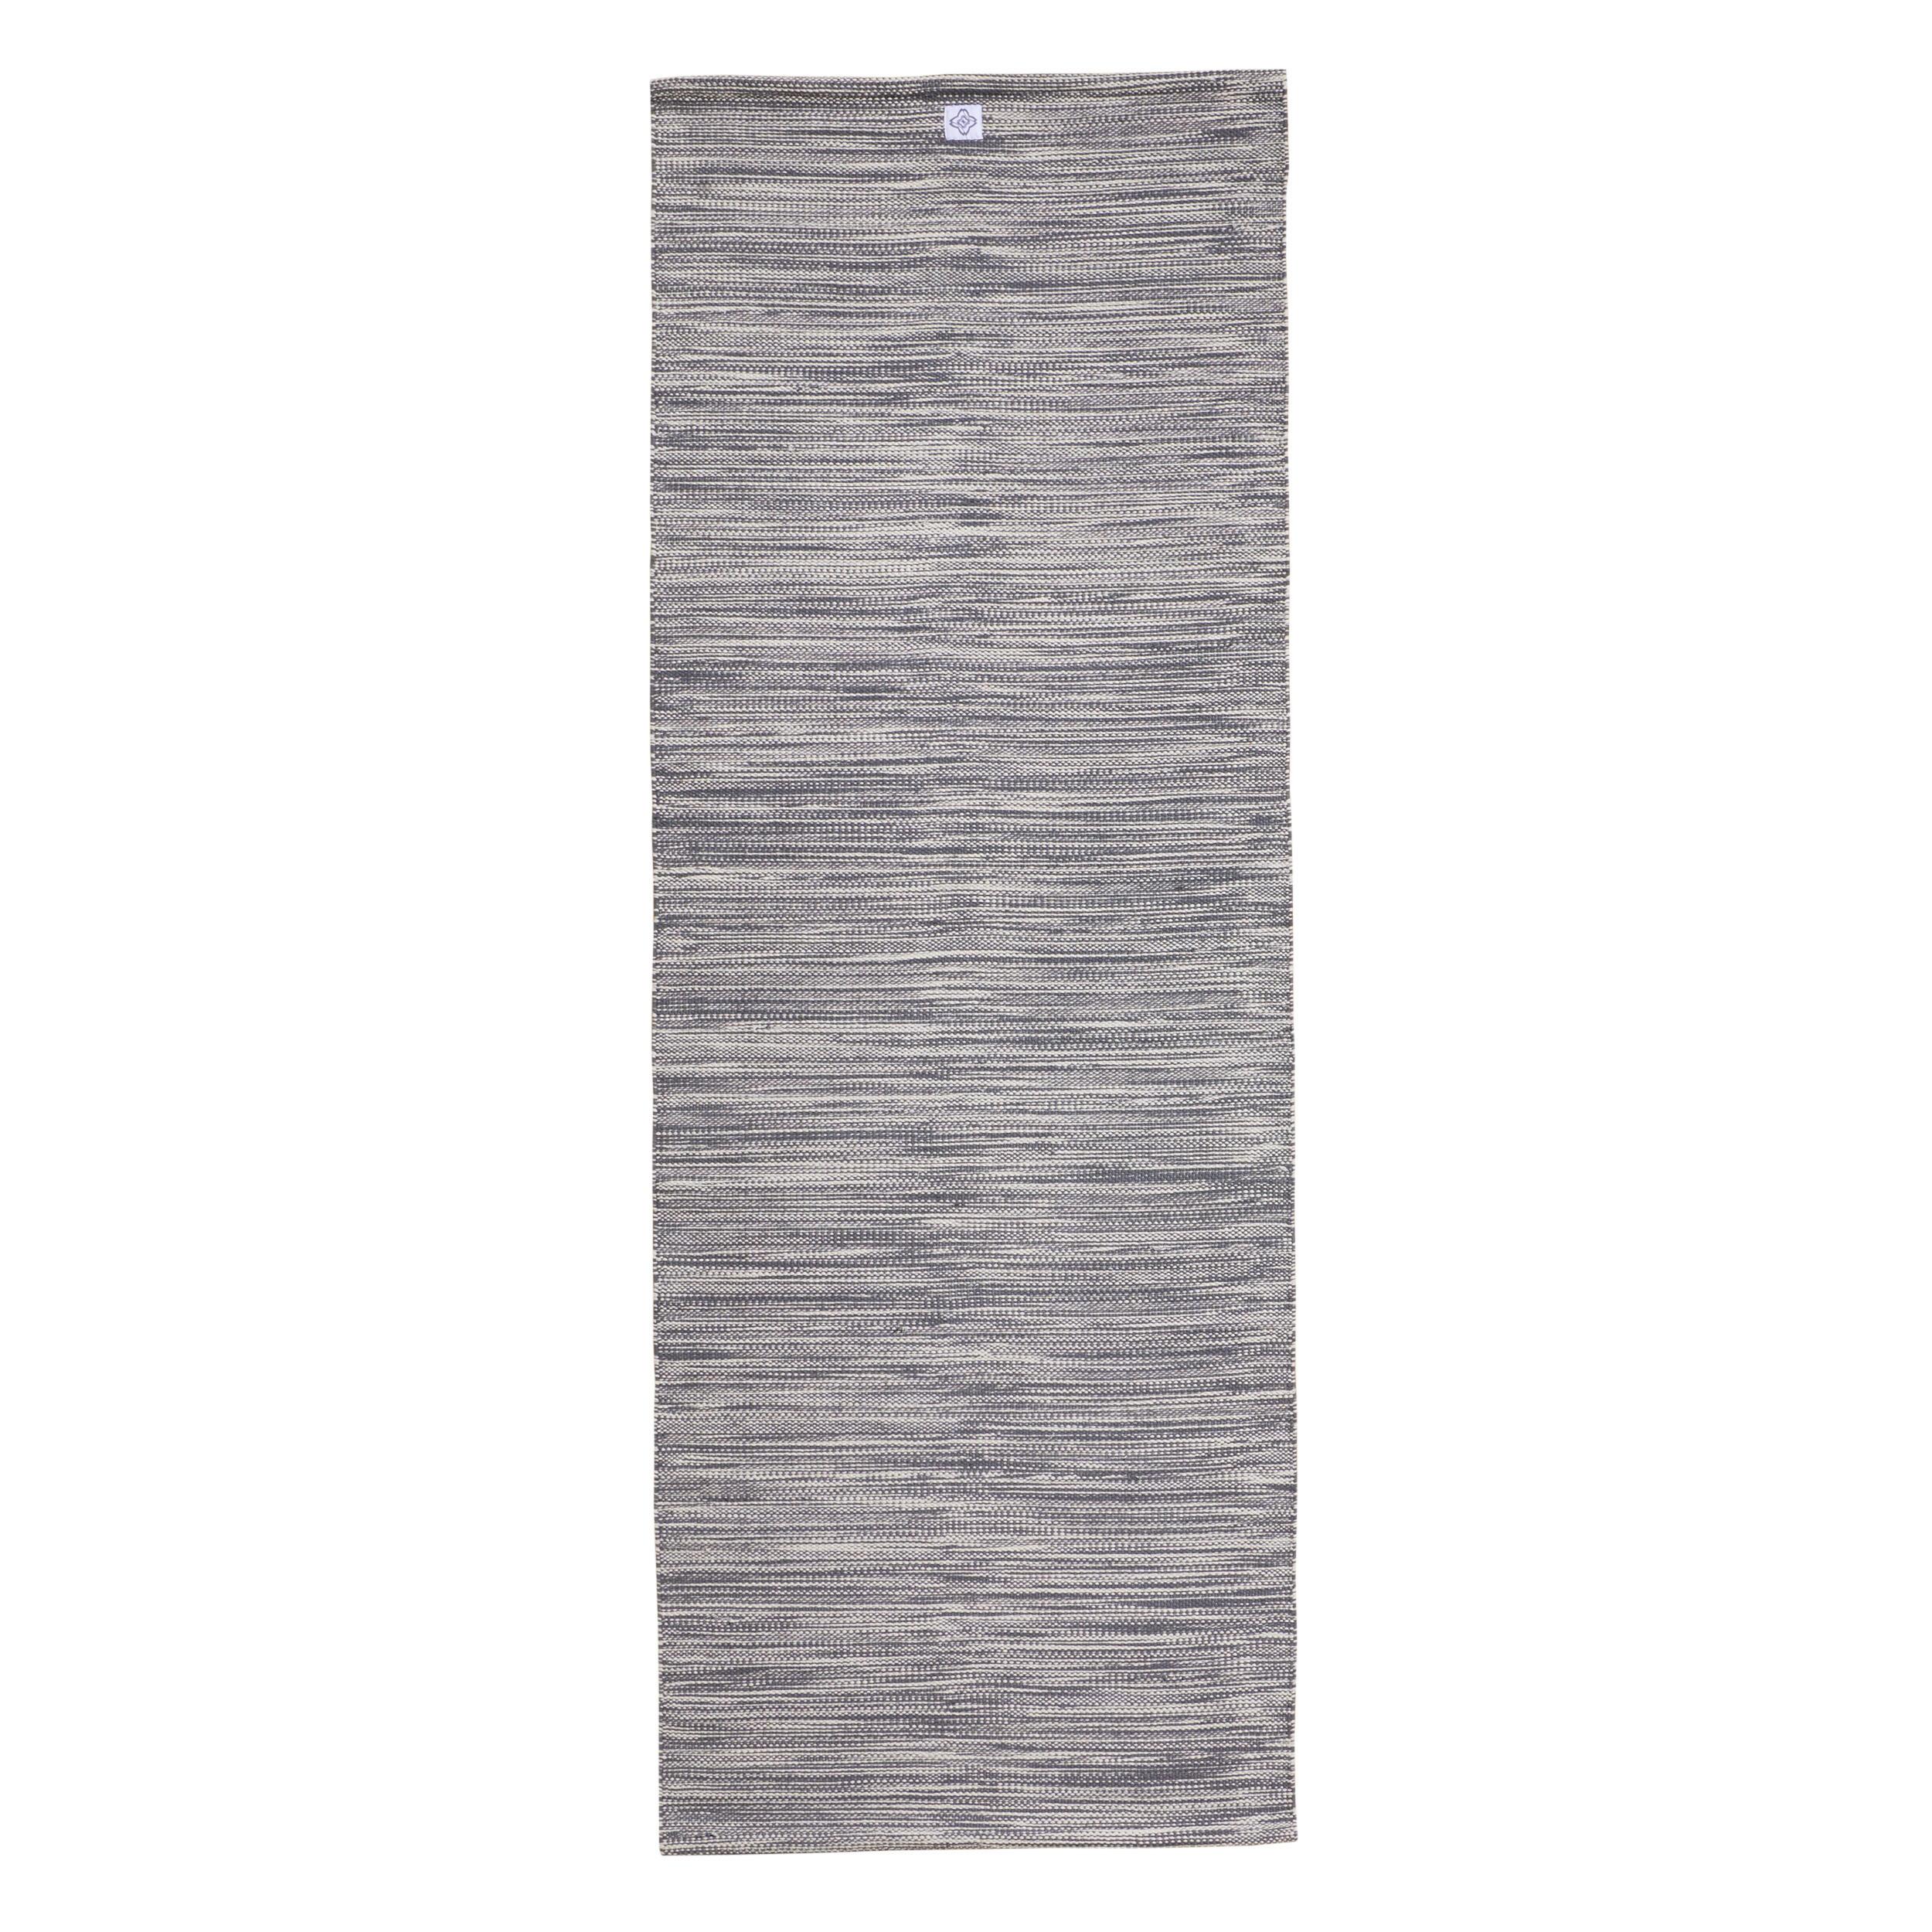 kimjaly tappetino yoga cotone grigio melange 189x69x0,4cm